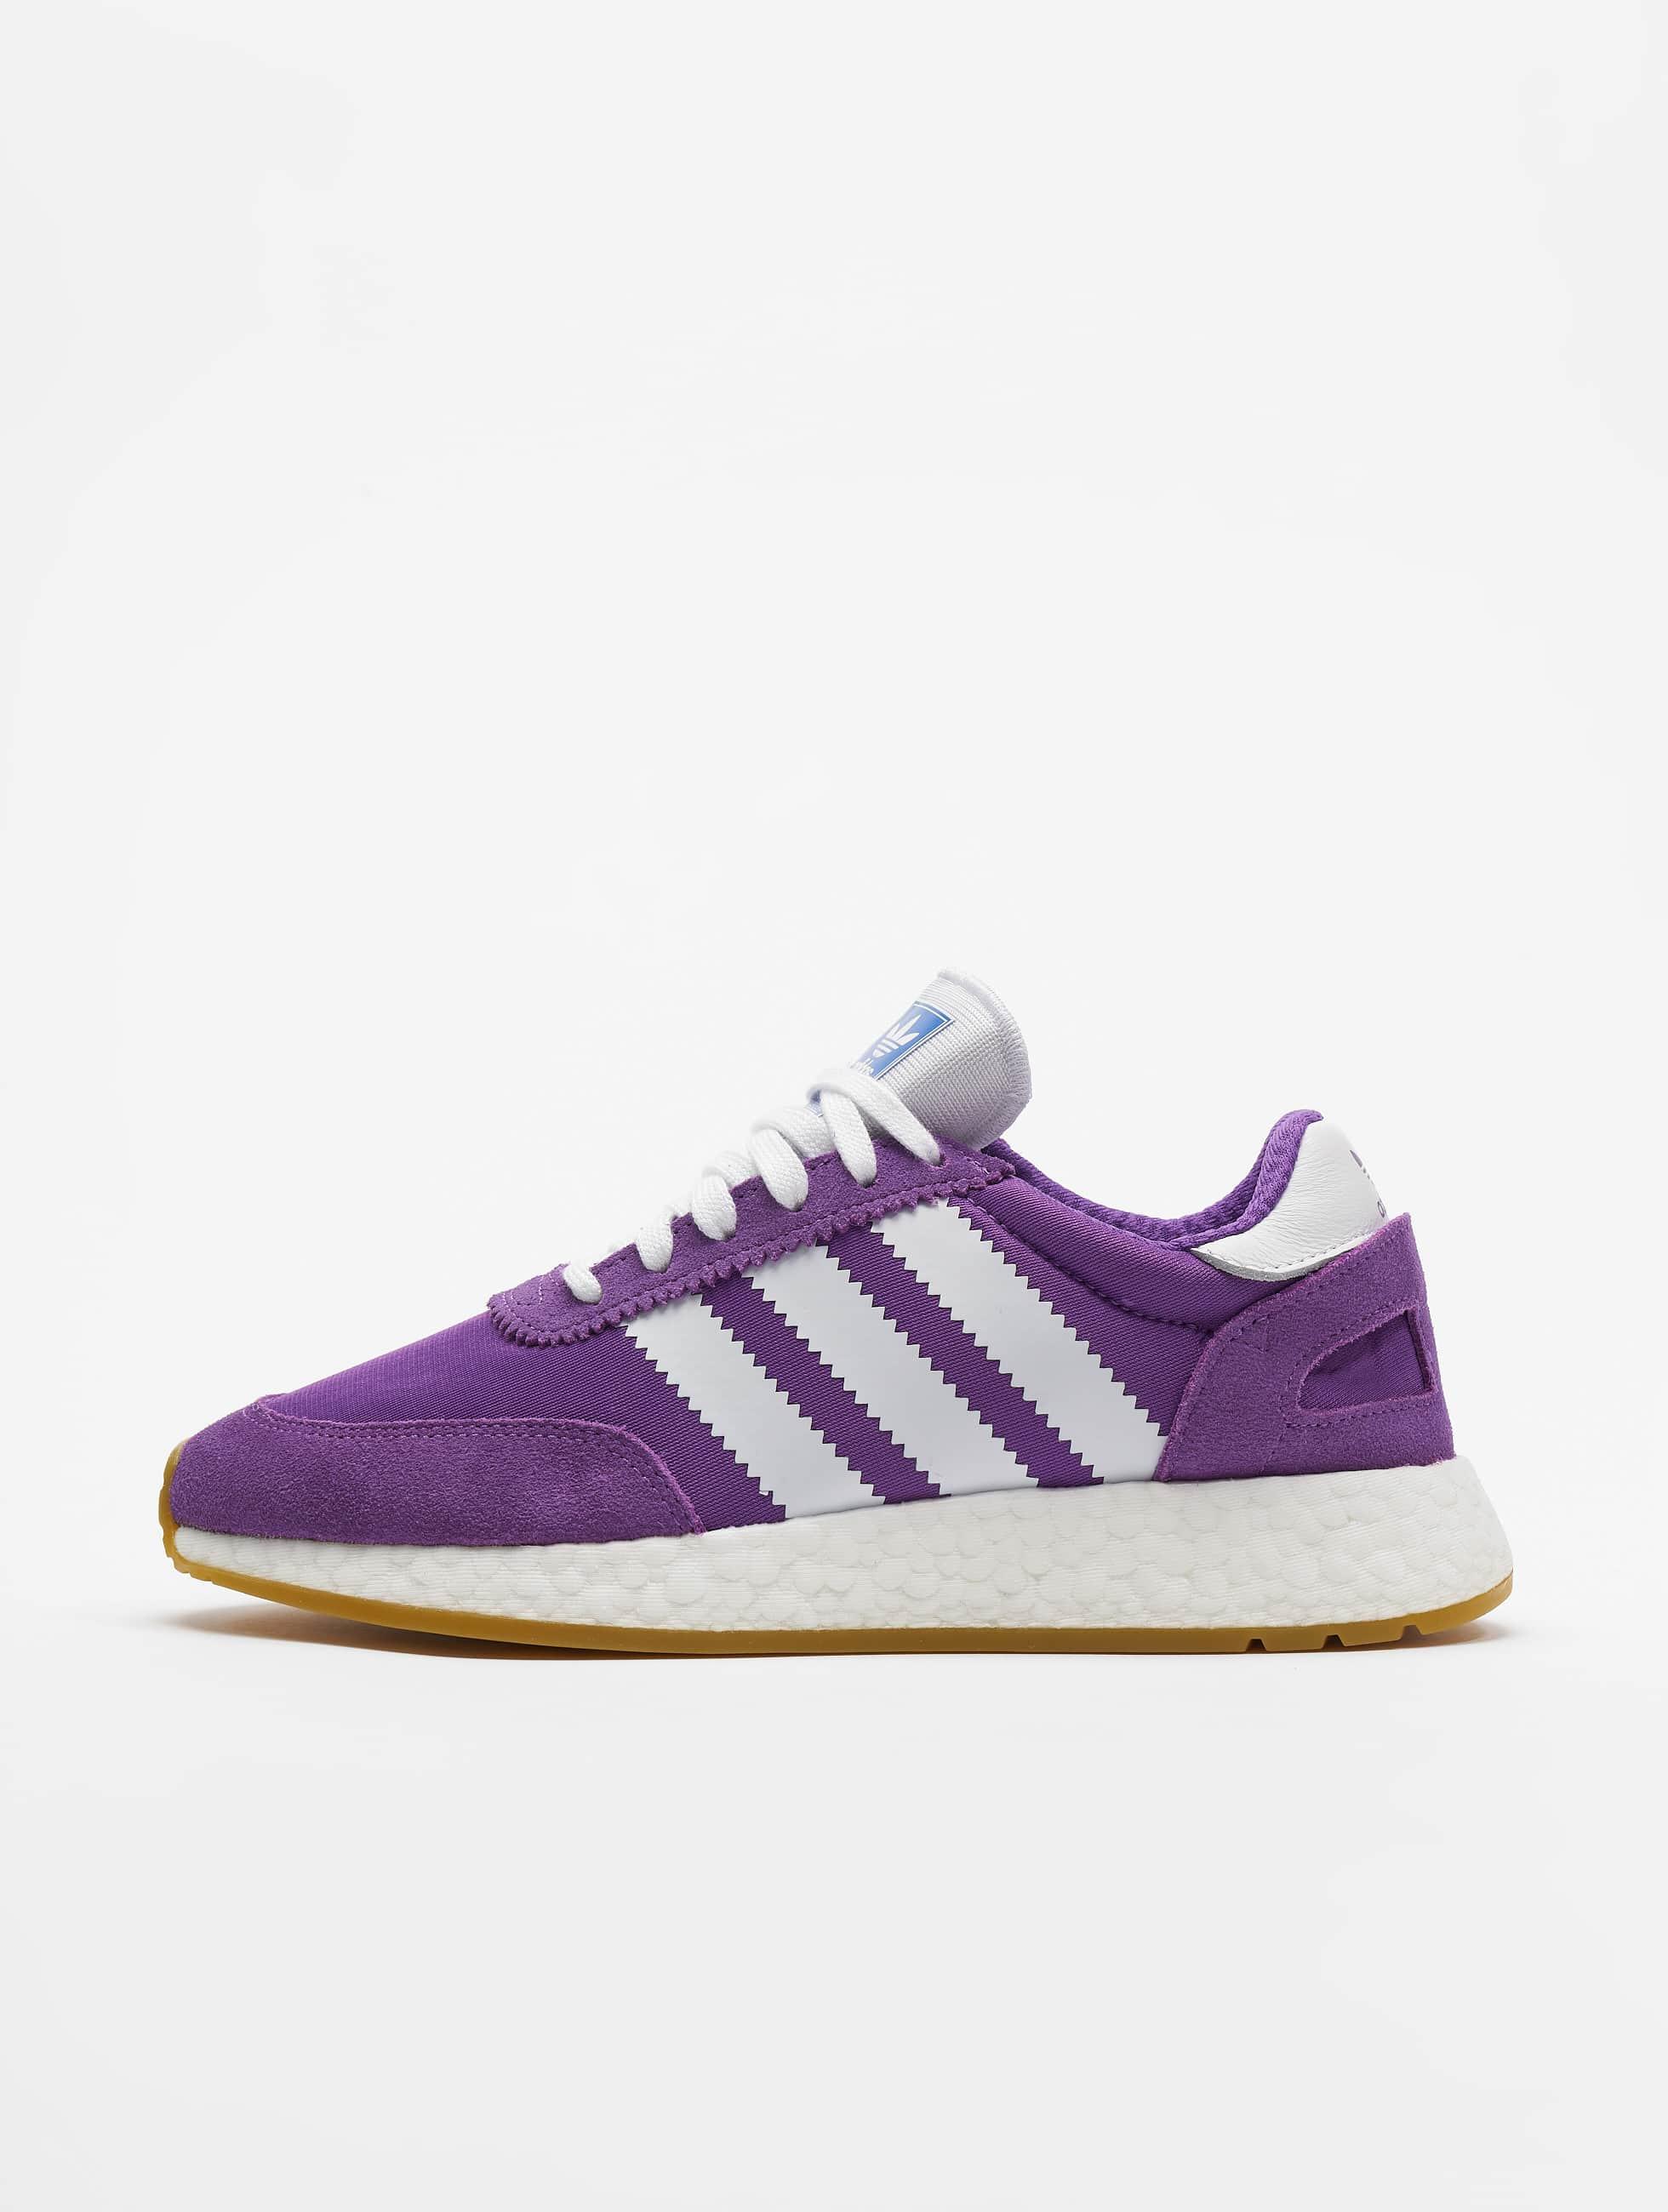 adidas gazelle purple ice